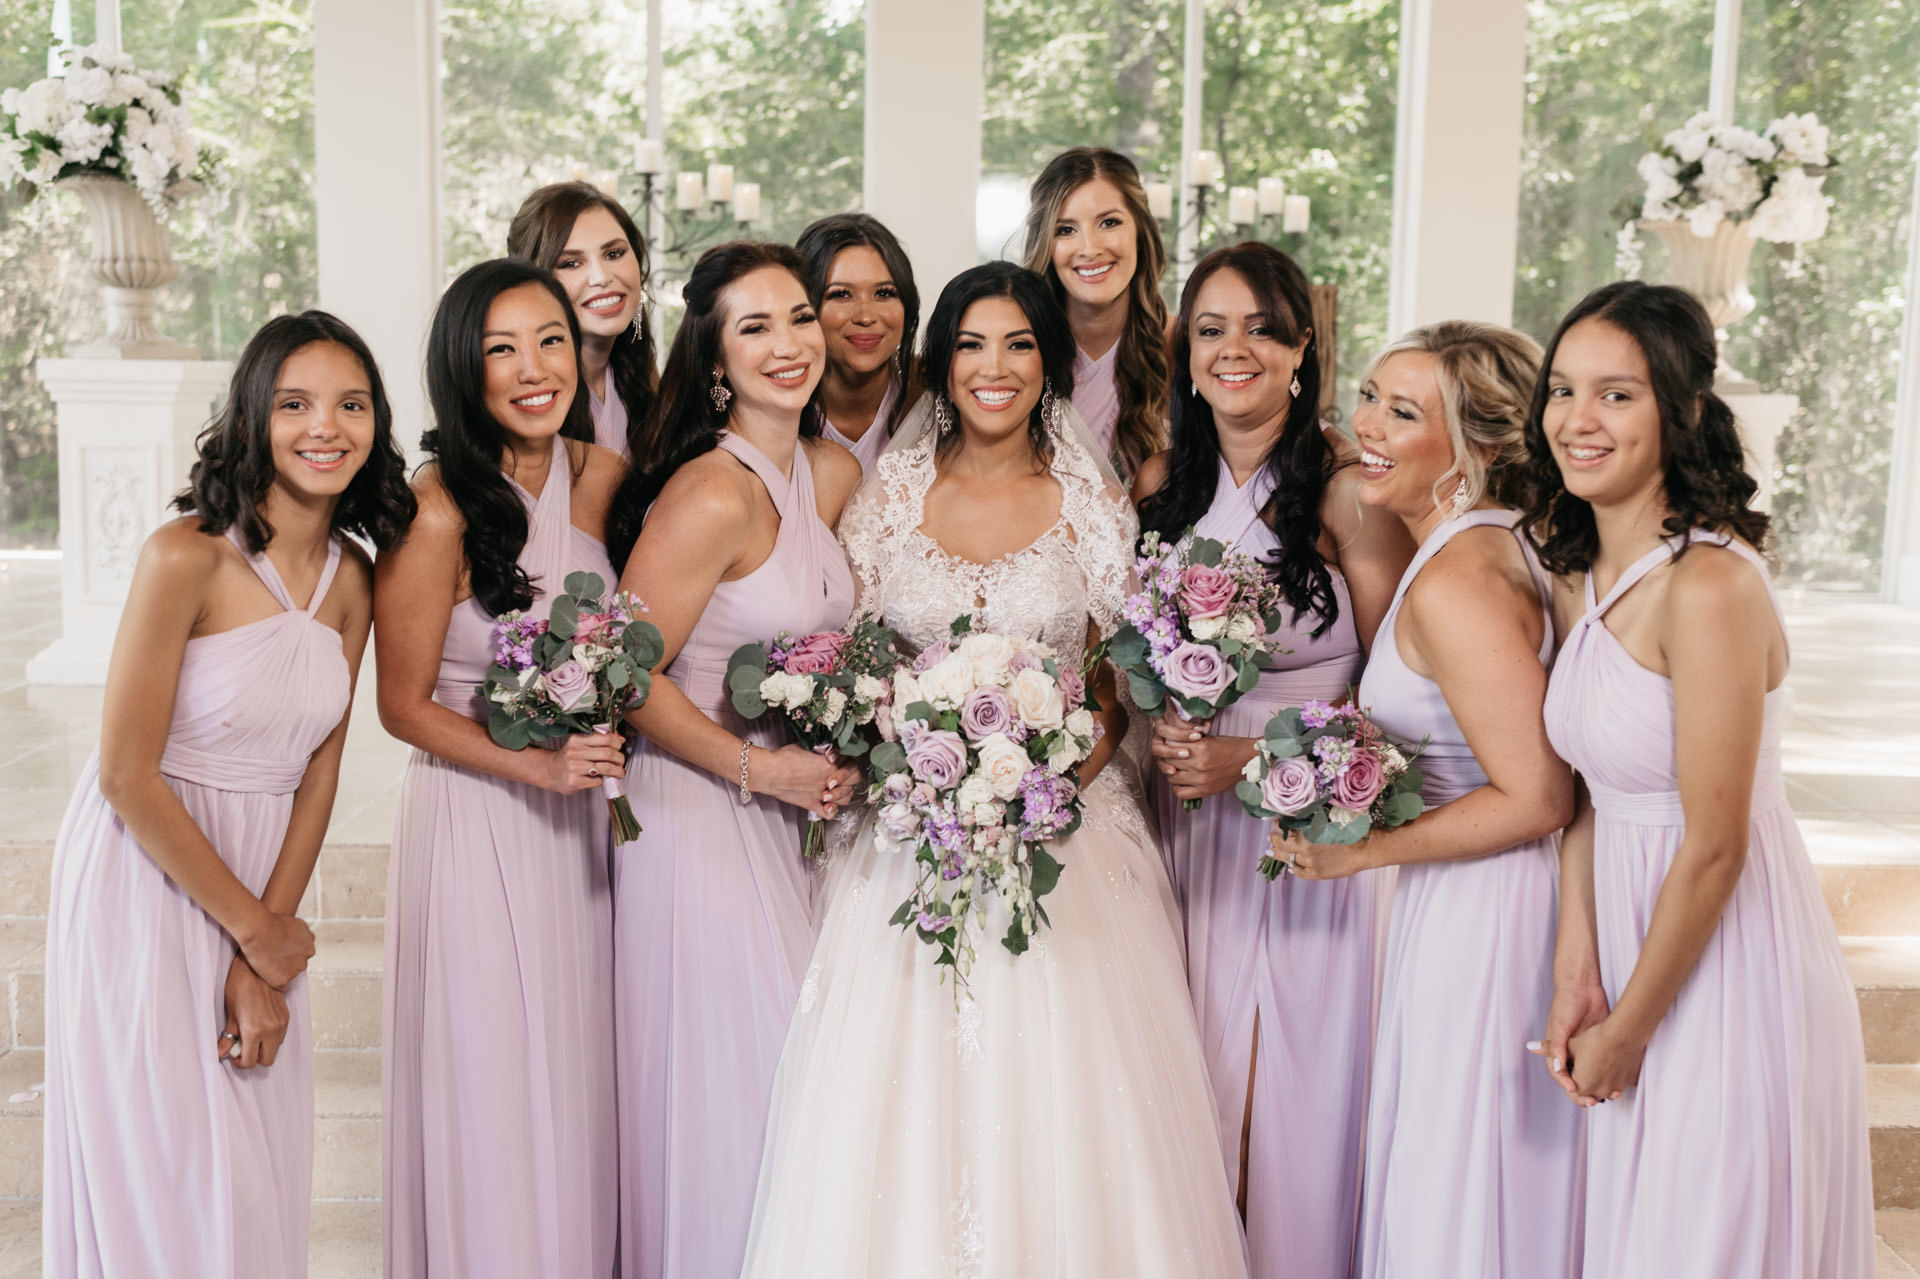 lexi-michael-wedding-blog-sm-64.jpg